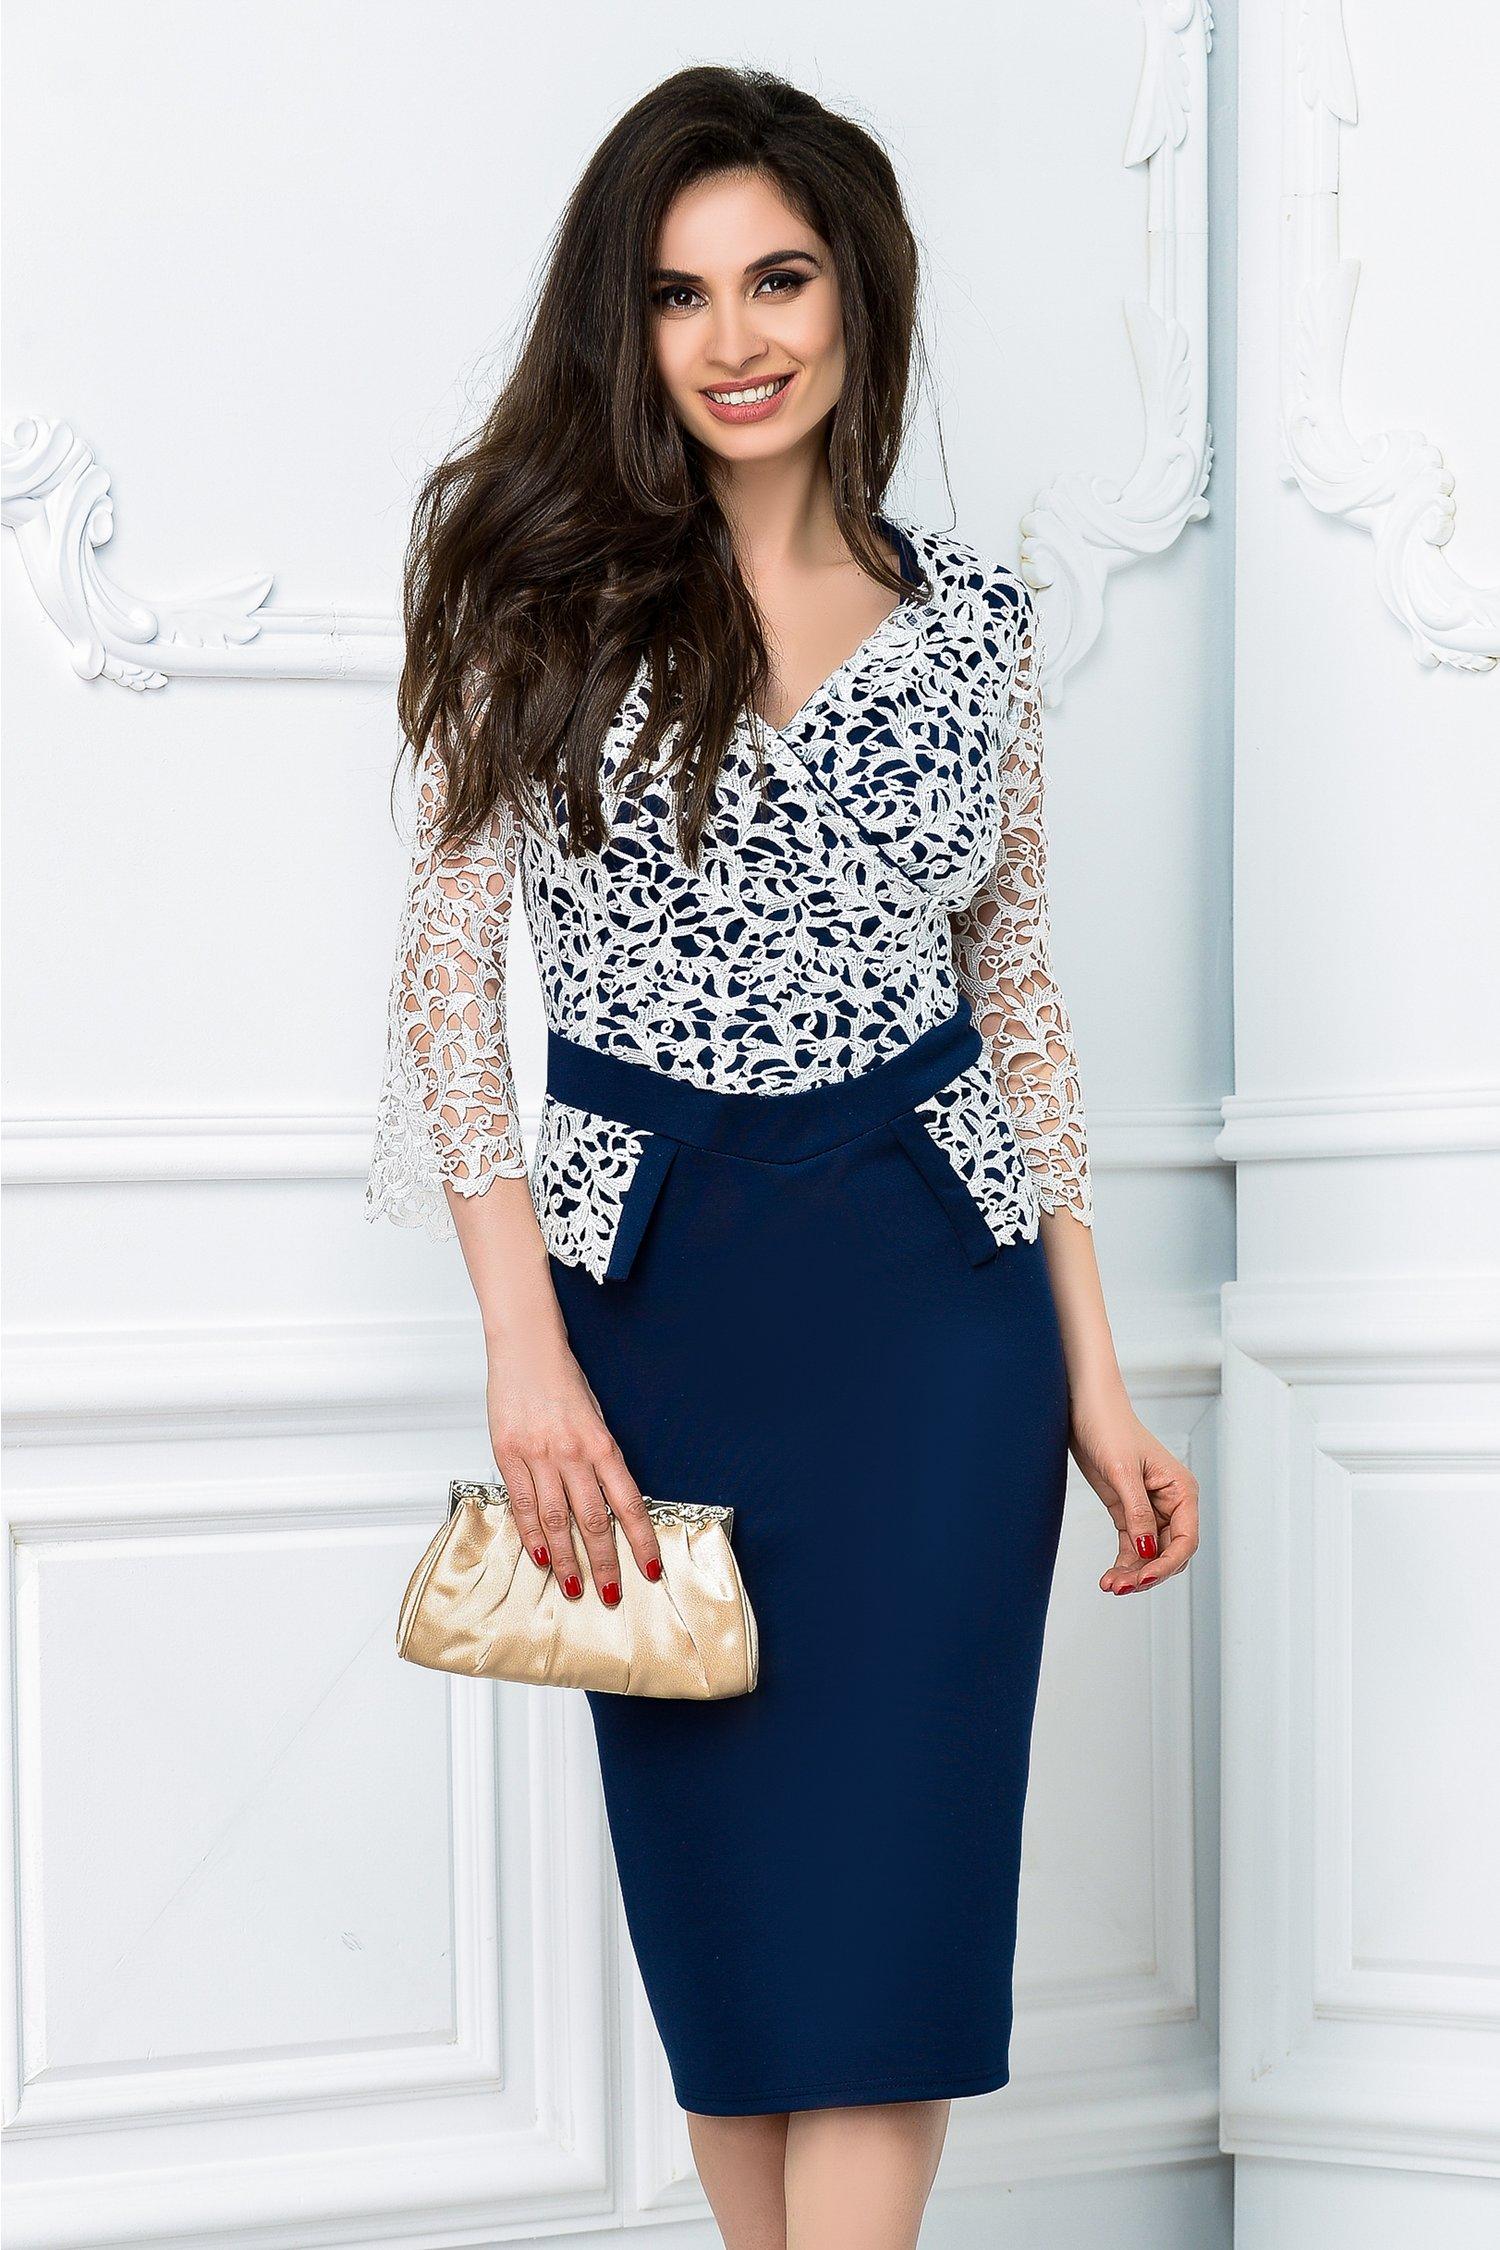 Rochie Calipso midi bleumarin cu alb cu decolteu de ocazie